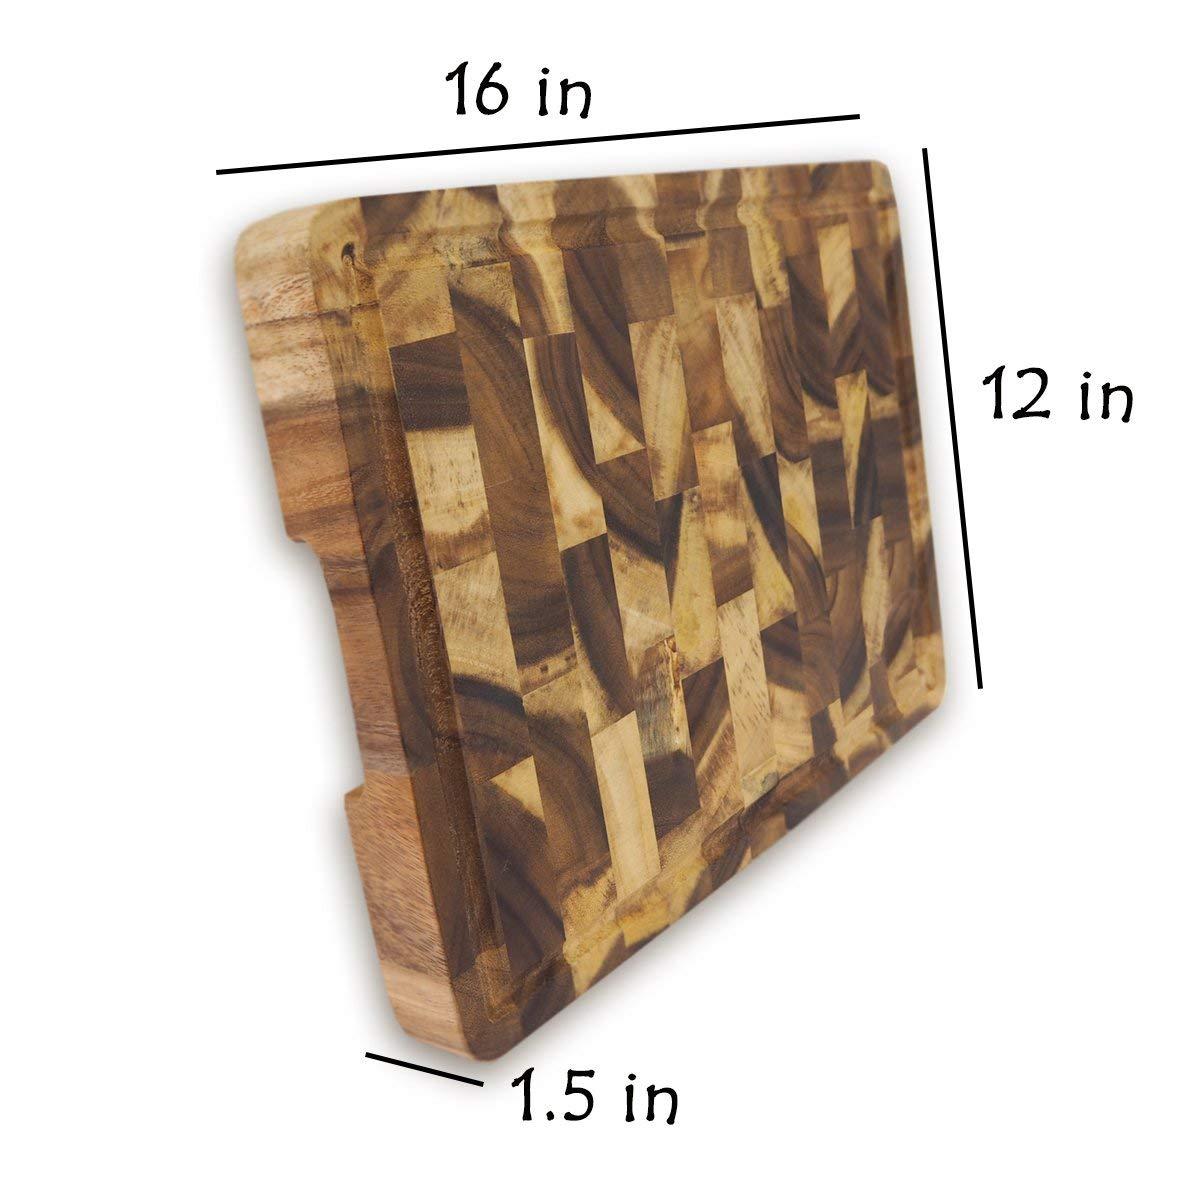 roro Rectangular End-Grain Acacia Kitchen Wood Cutting Board and Block by roro (Image #3)